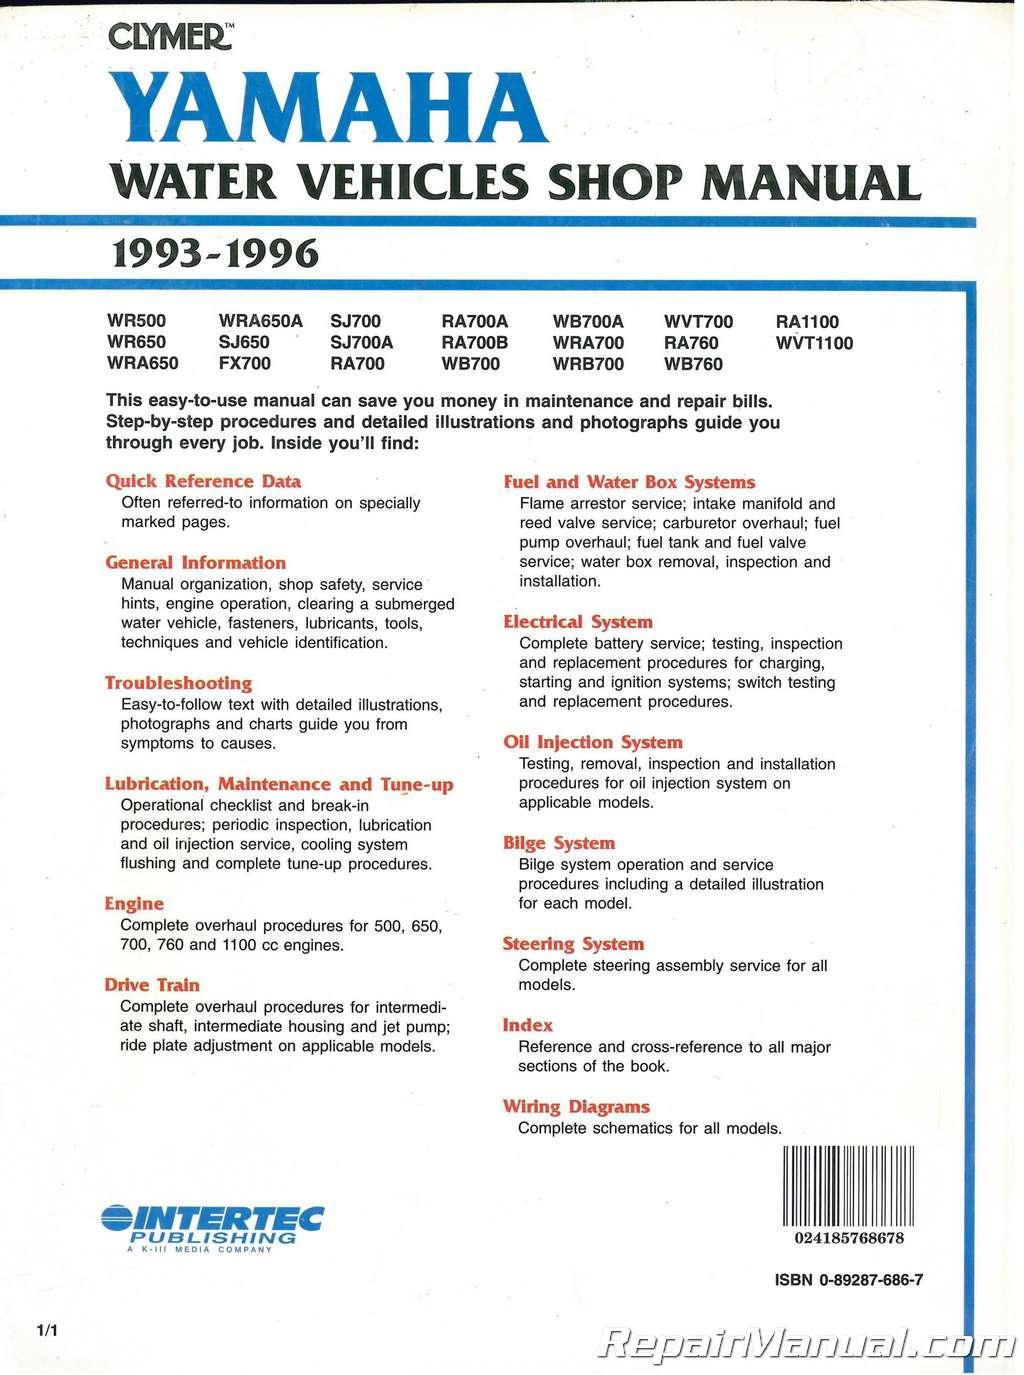 USED 1993-1996 Yamaha Waverunner Clymer Personal Watercraft Service Manual